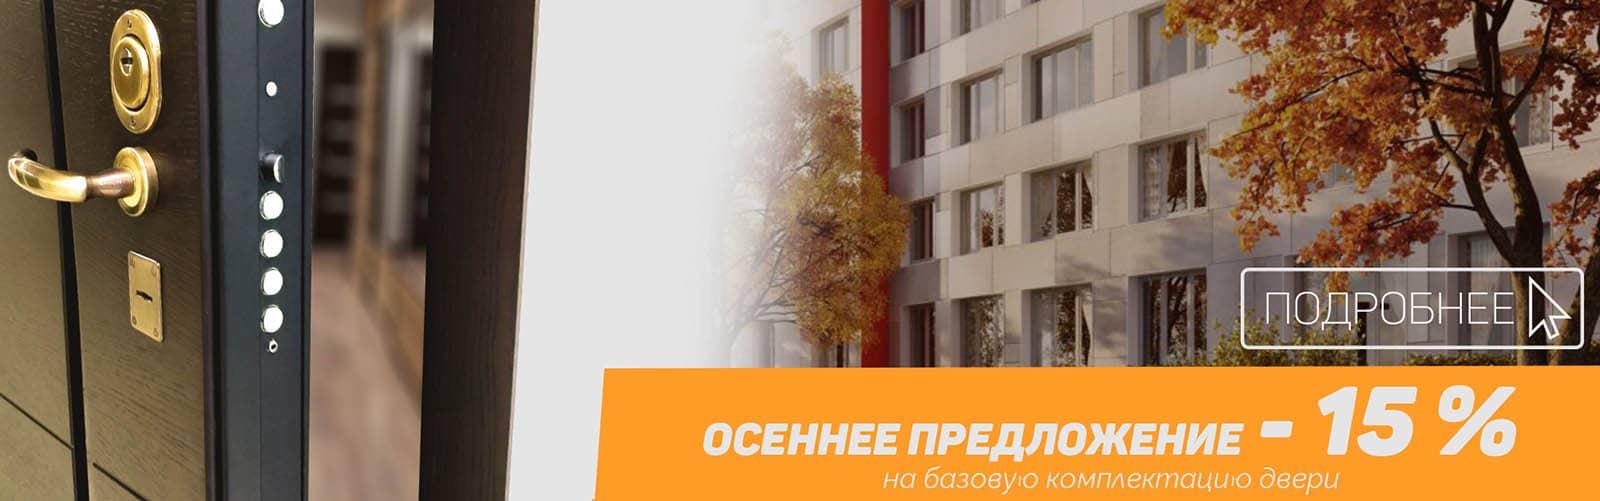 discount_15_osen